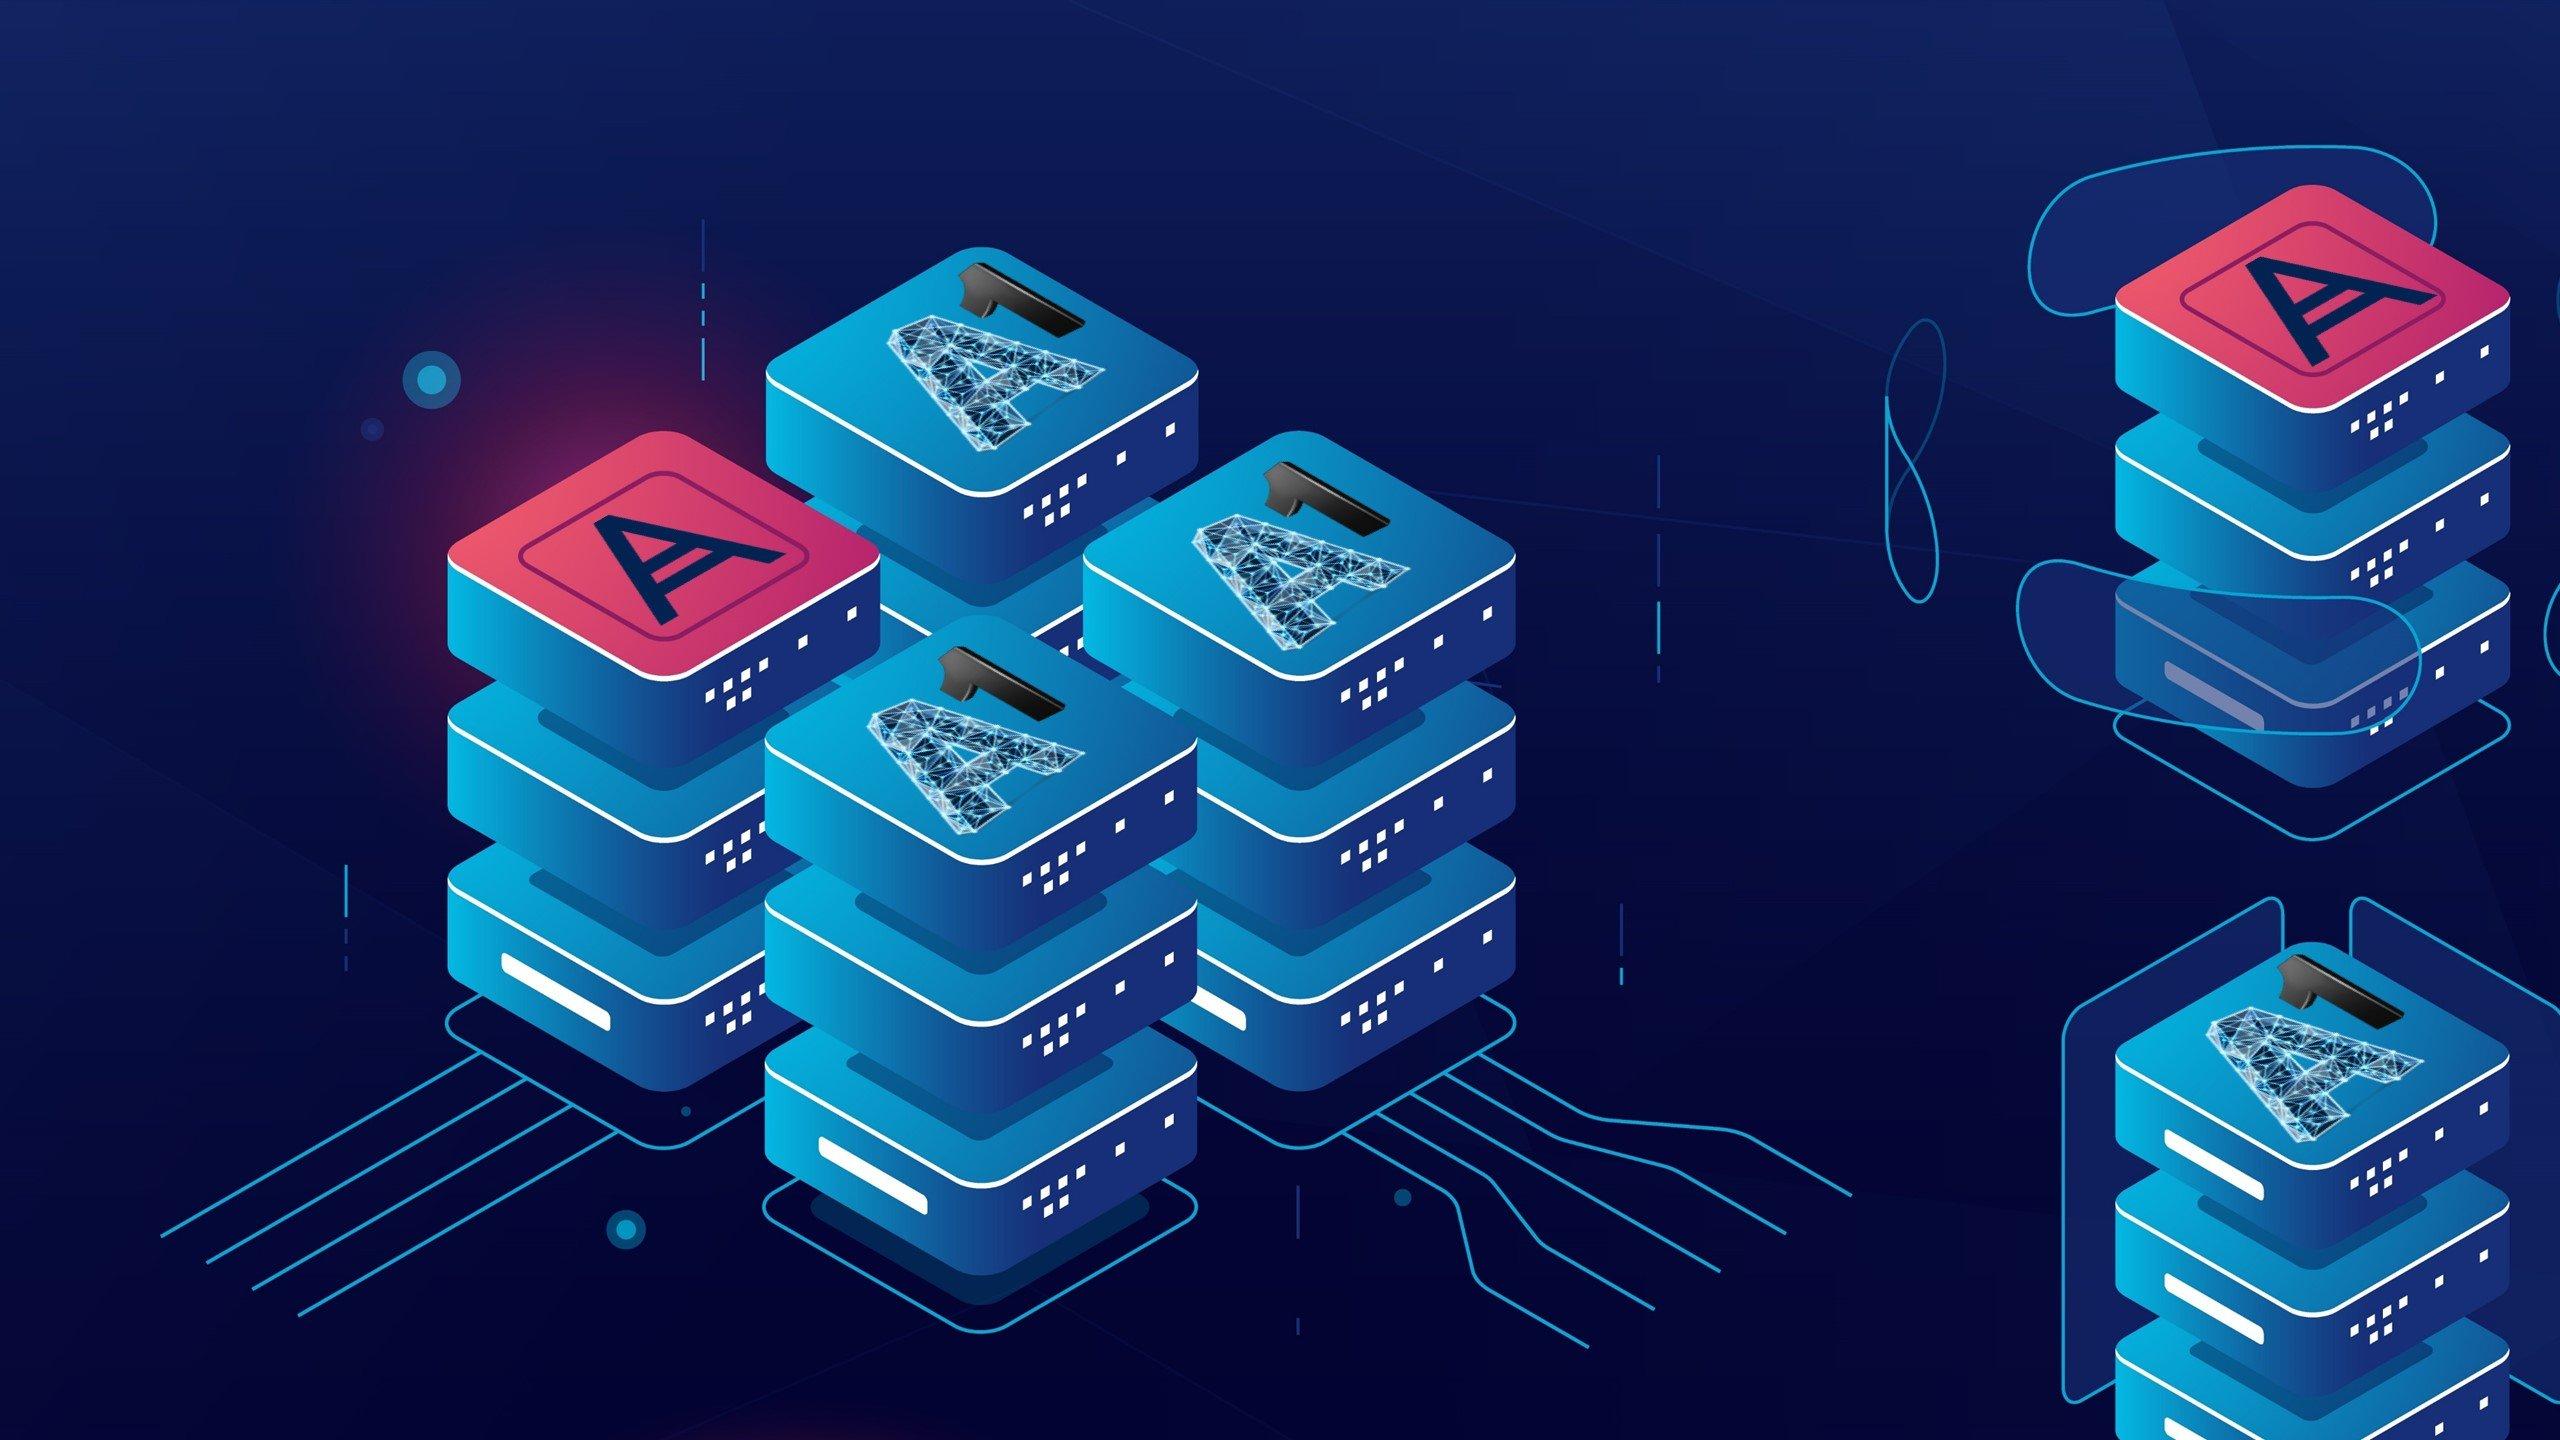 a1-data-centers-acronis-platform